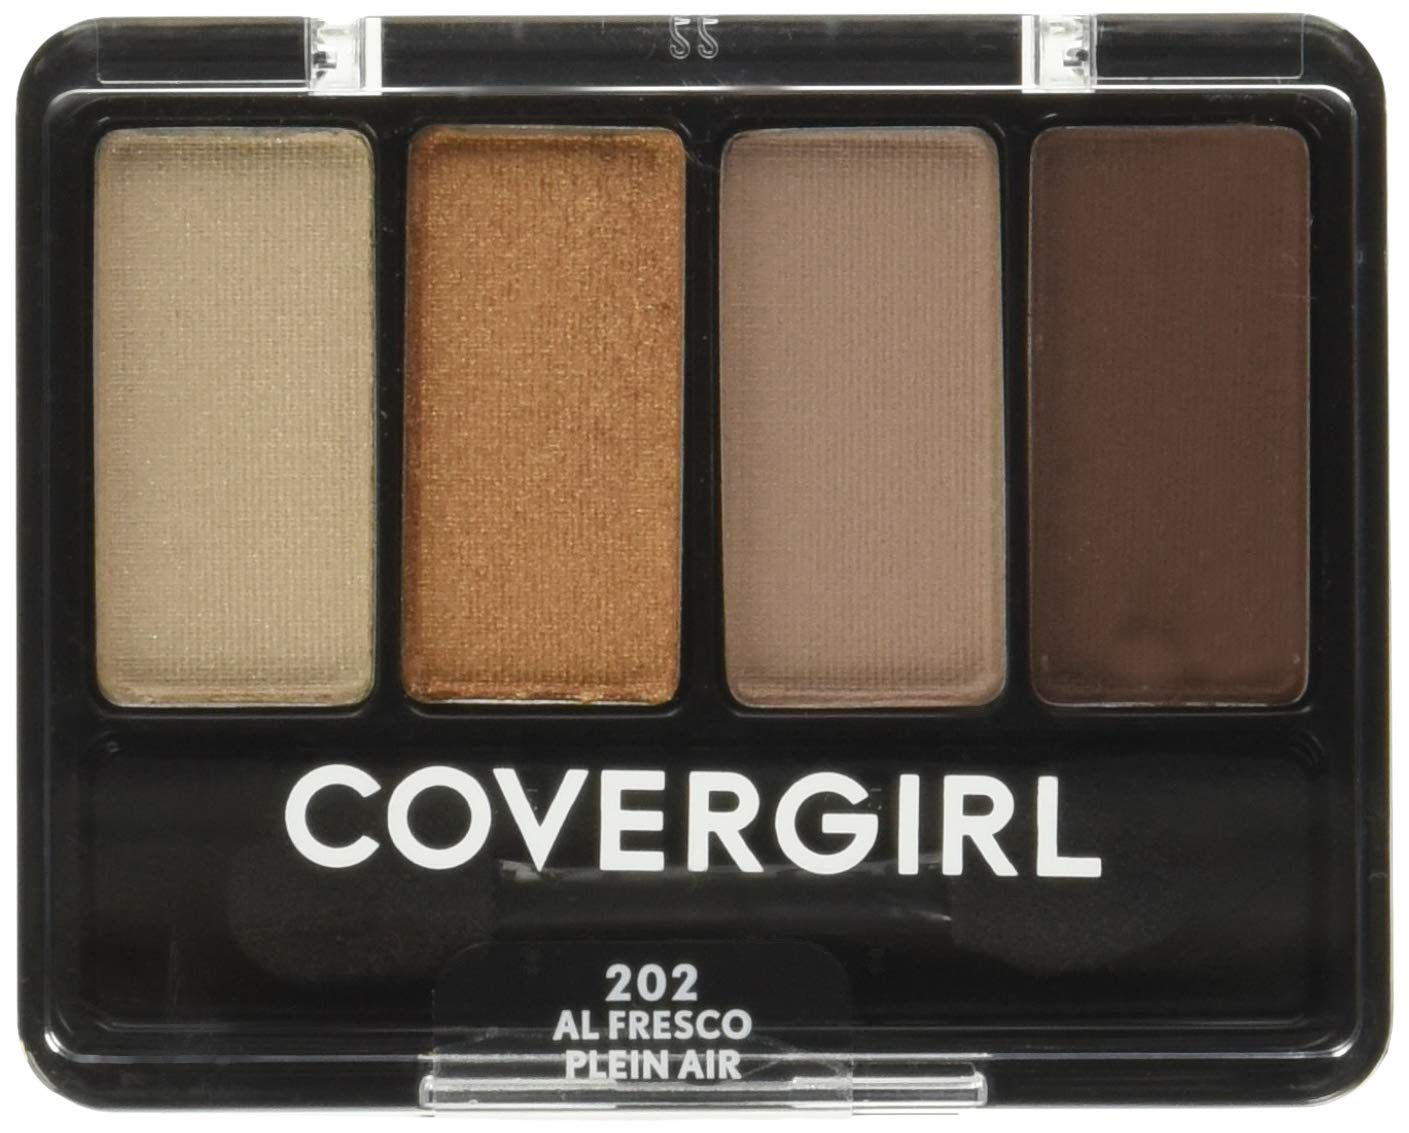 CoverGirl Eye Enhancers 4Kit Eyeshadow Palette in Al Fresco 202